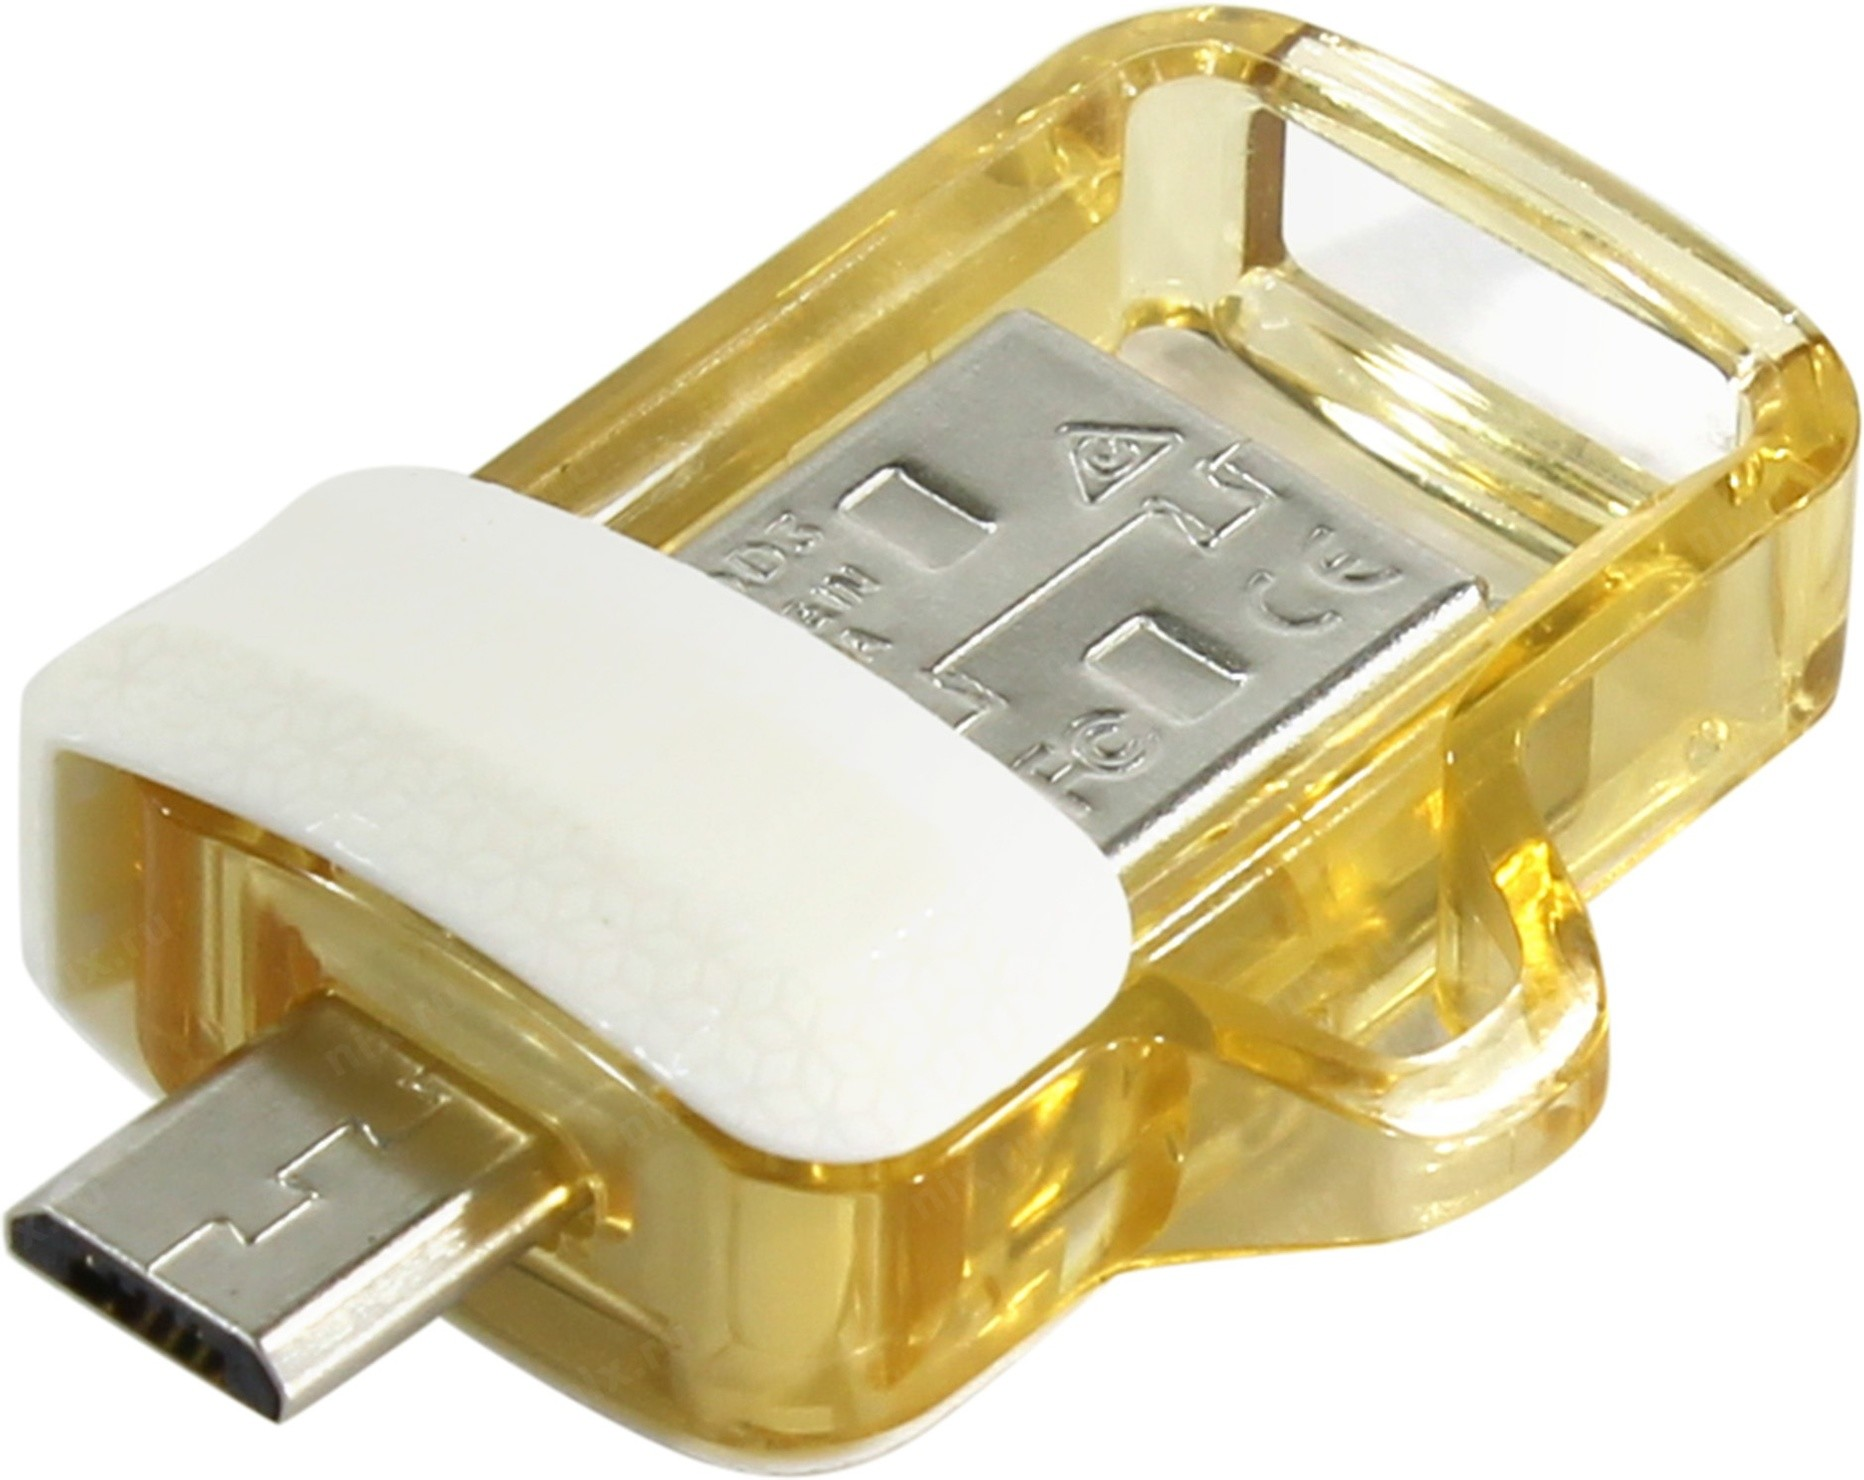 Флешка SanDisk Ultra Dual SDDD3-064G-G46GW 64 Гб — купить, цена и характеристики, отзывы